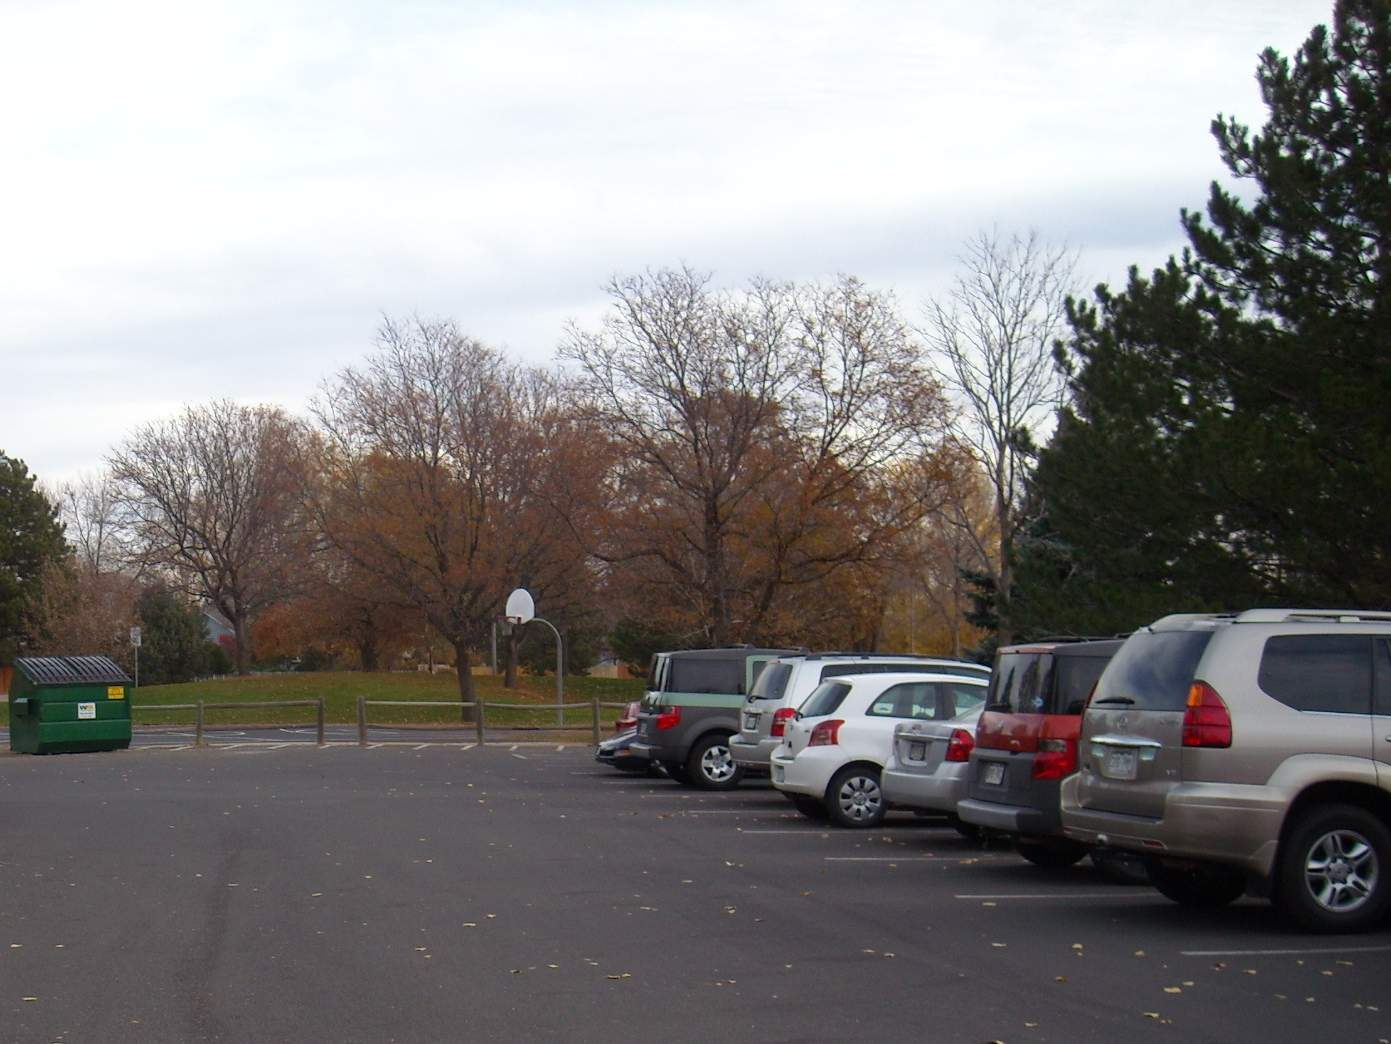 Warren Park, parking lot, Fort Collins